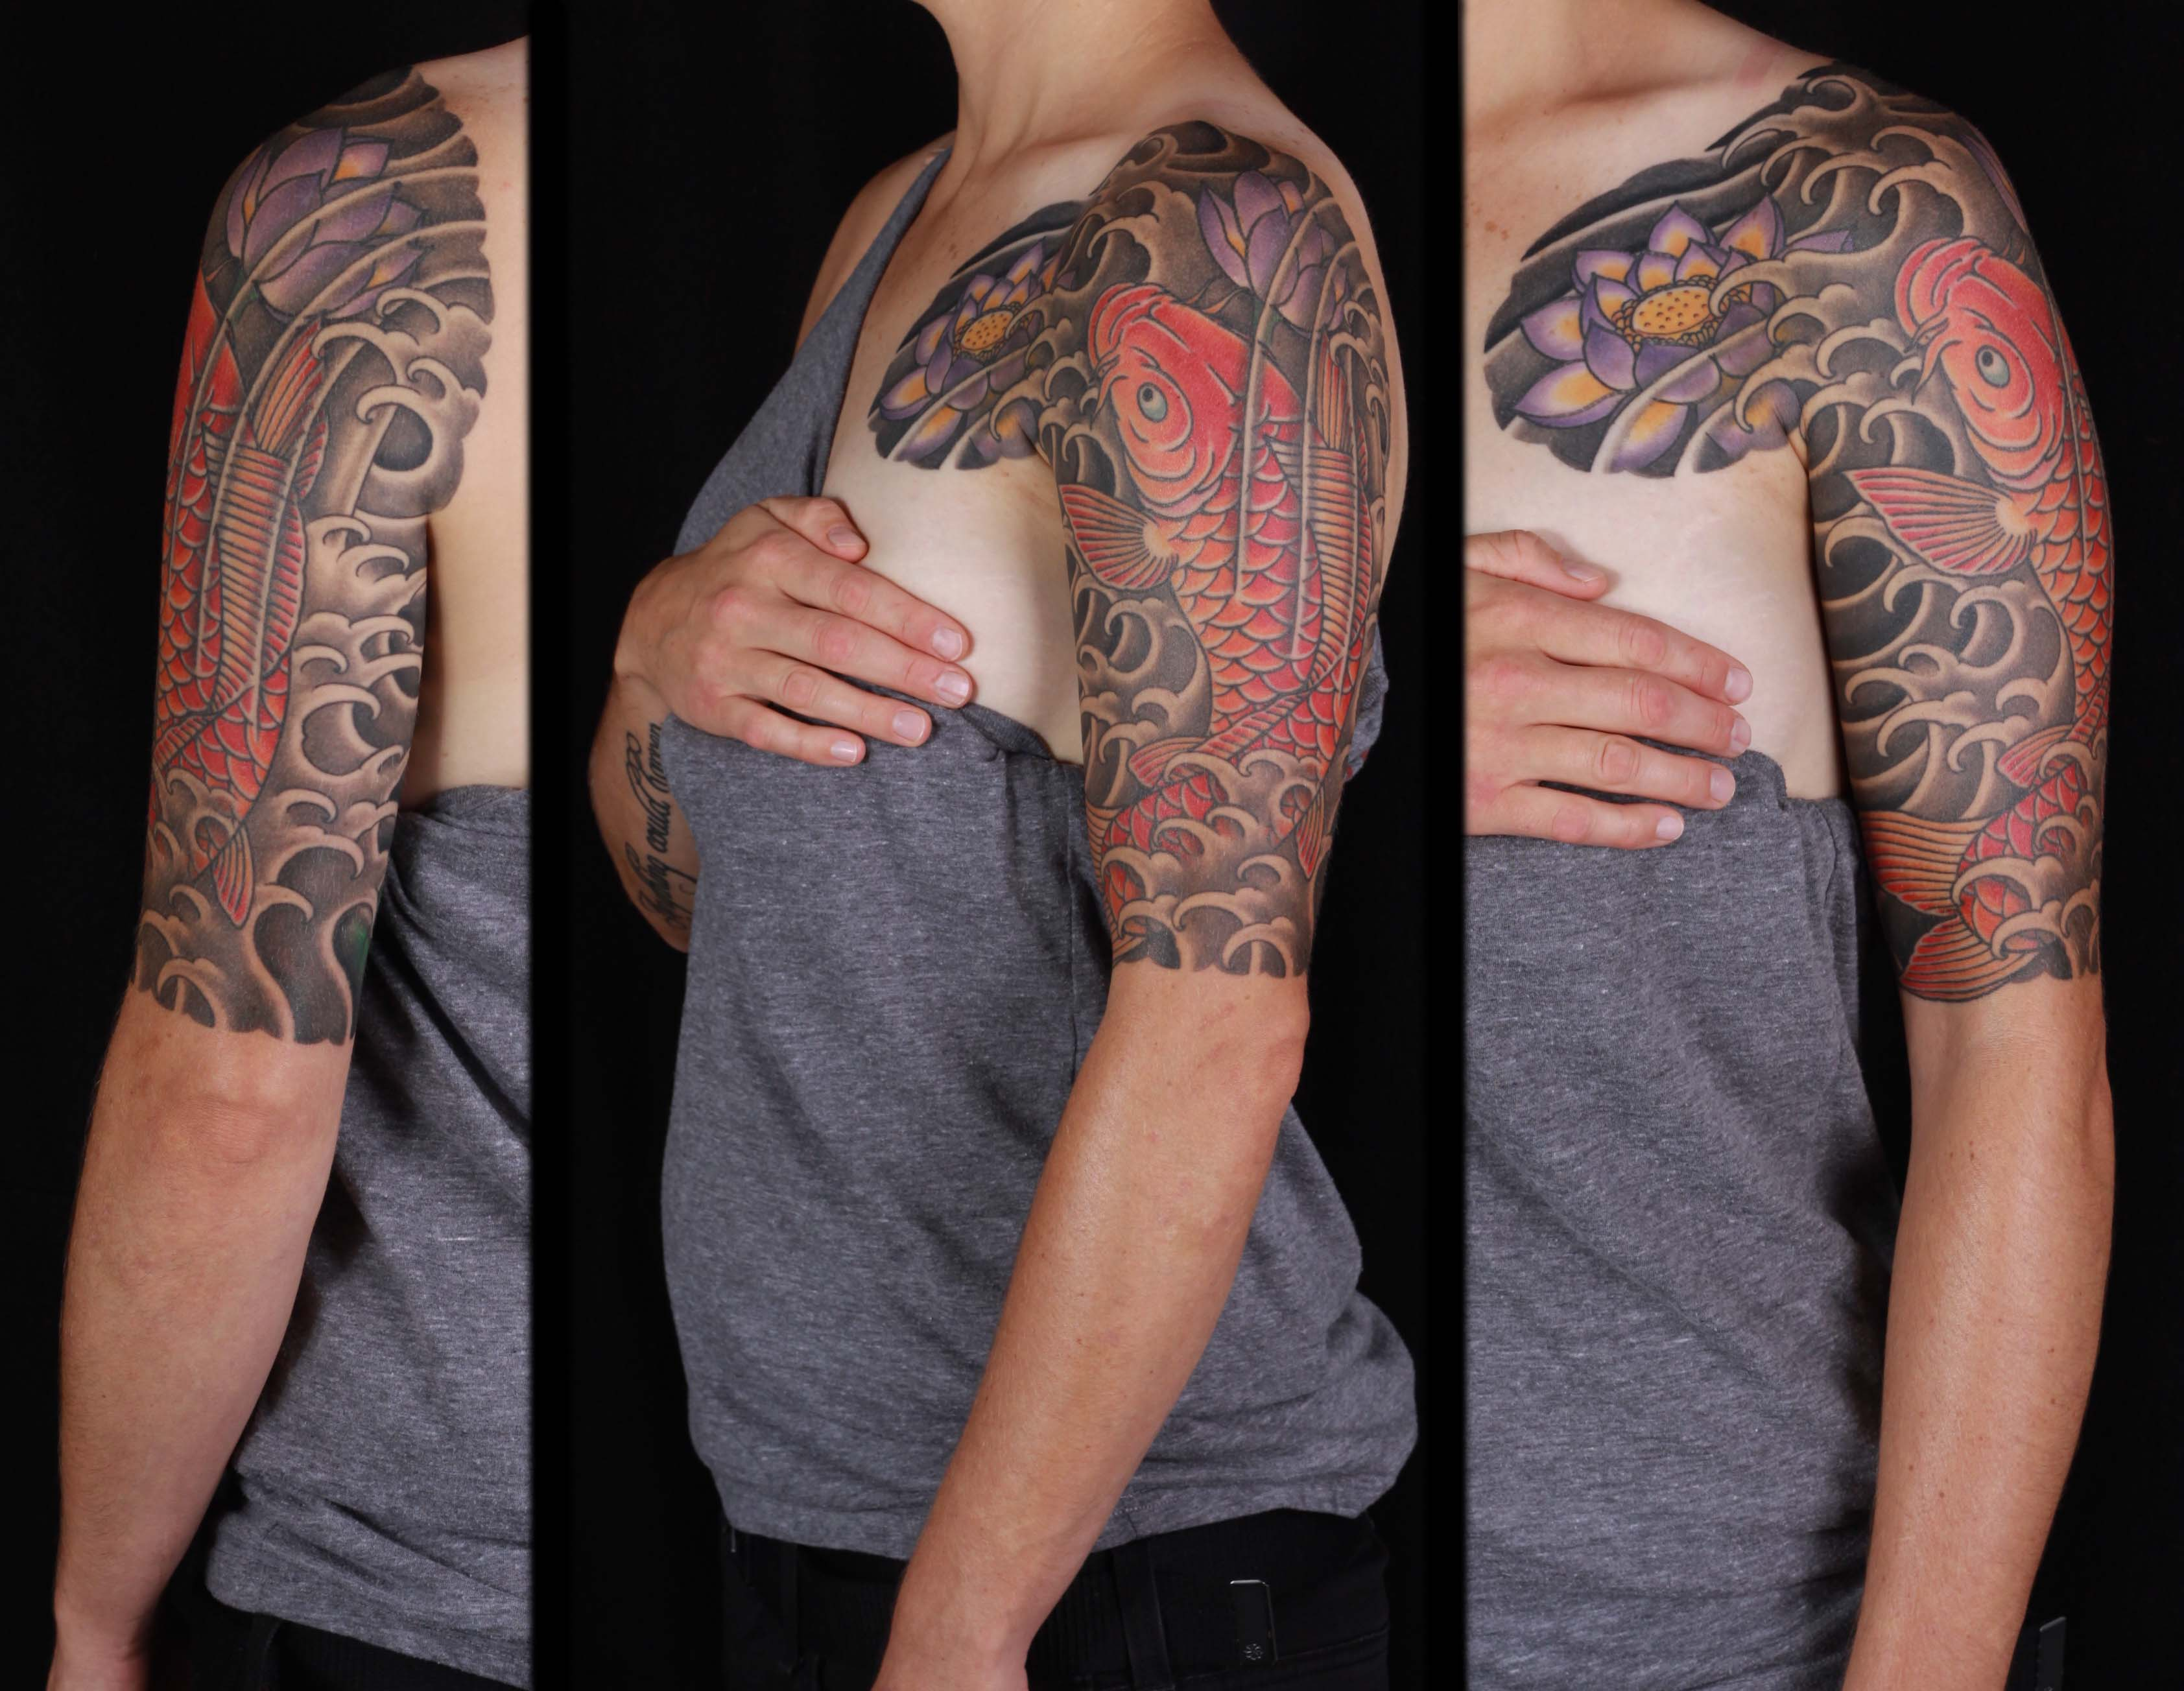 brian-thurow-dedication-tattoo-japanese-half-sleeve-arm-chest-koi-water-waves-lotus